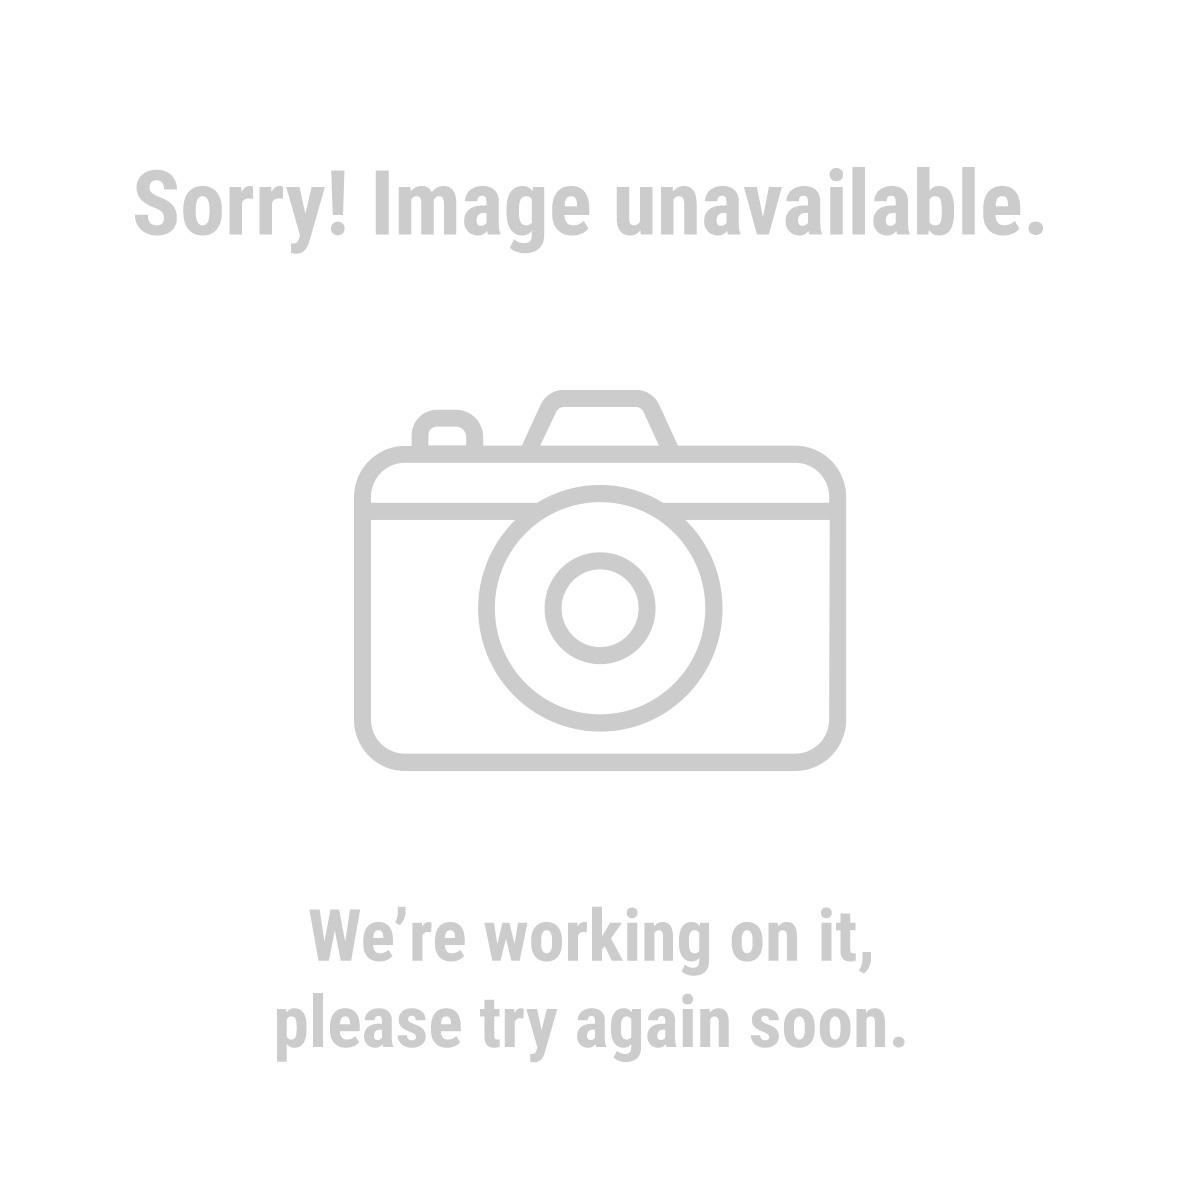 "Drill Master 68287 18 Volt Cordless 3/8"" Drill/Driver and Flashlight Kit"